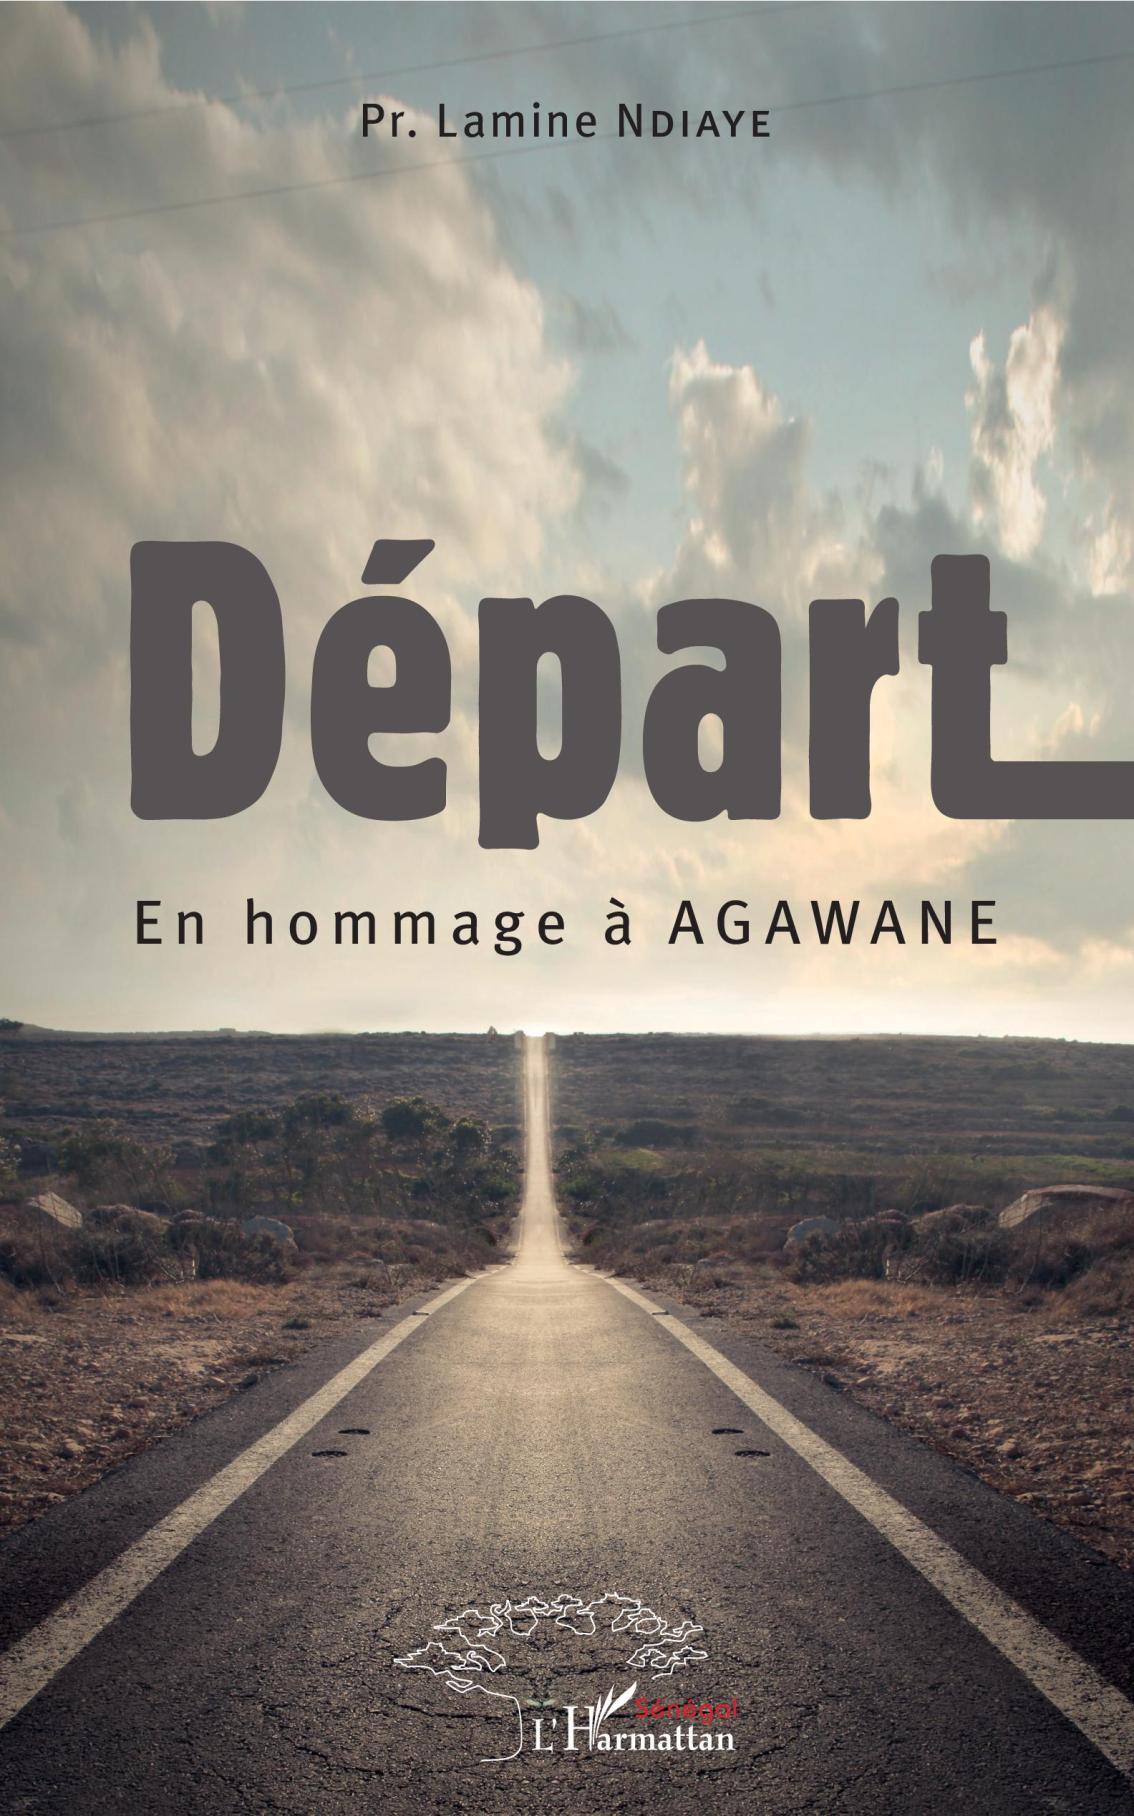 Départ – En hommage à Agawane – Lamine Ndiaye (Pr.) –2019